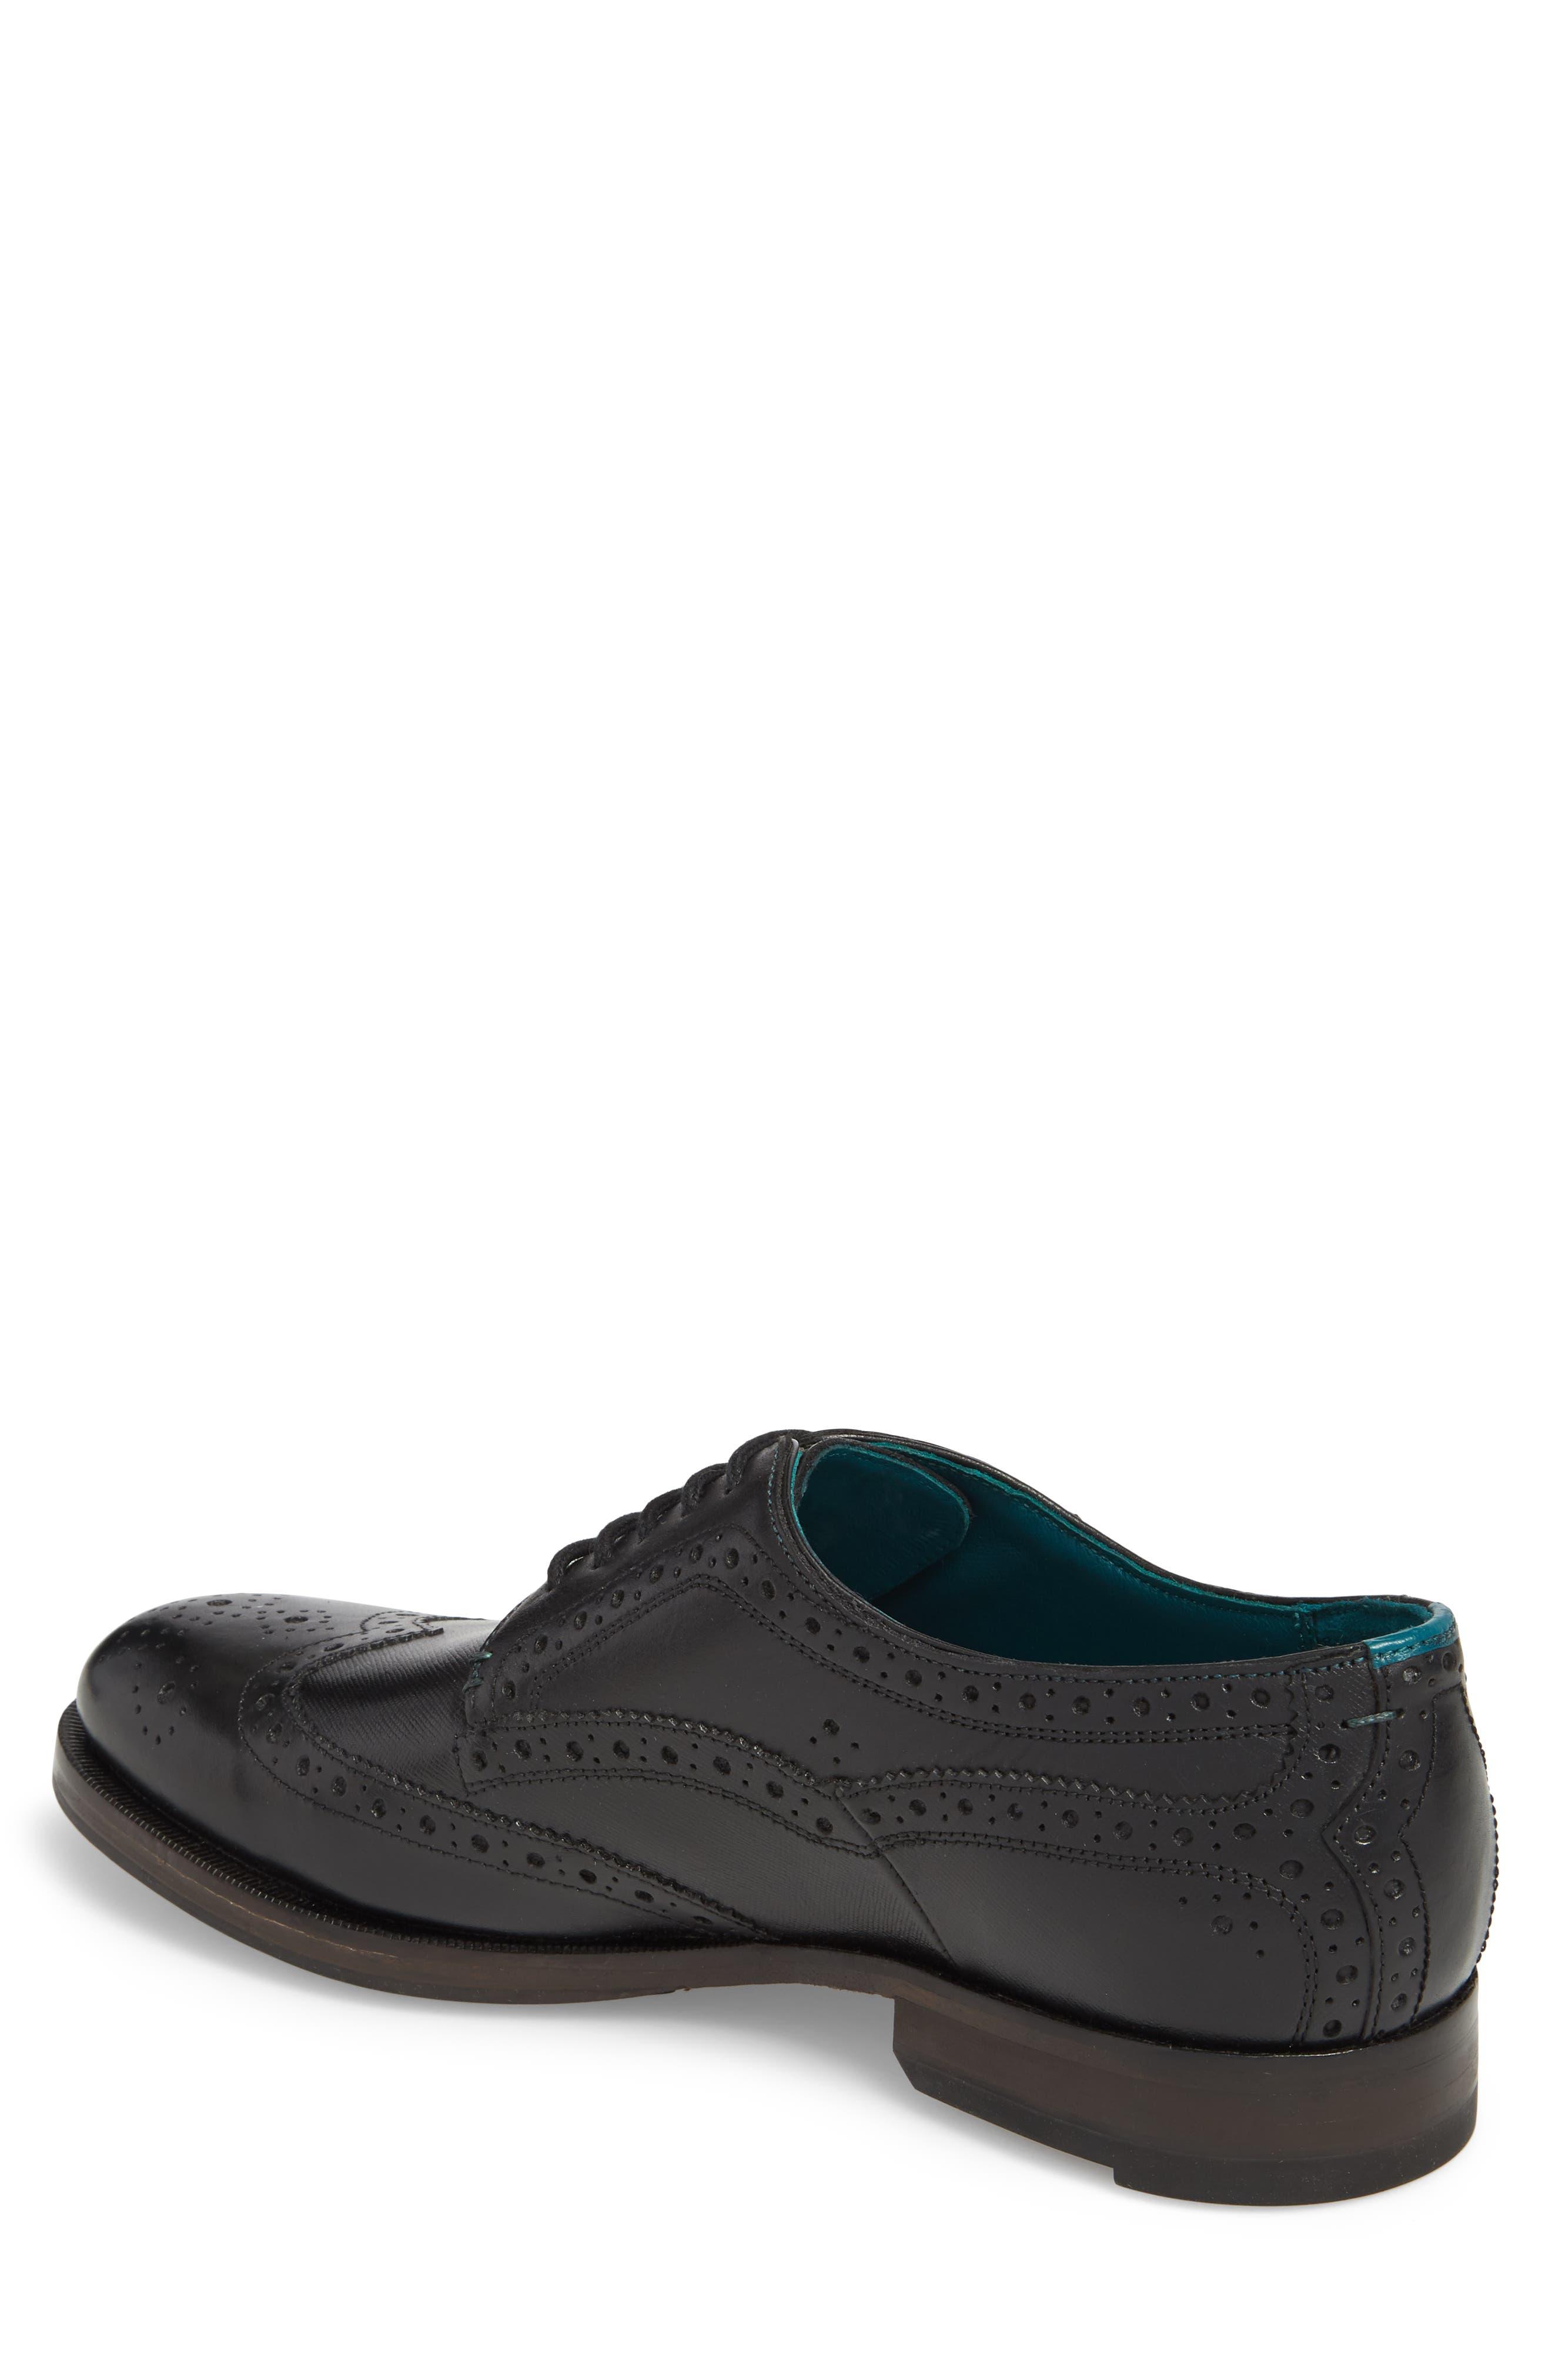 Senape Wingtip,                             Alternate thumbnail 2, color,                             Black Leather